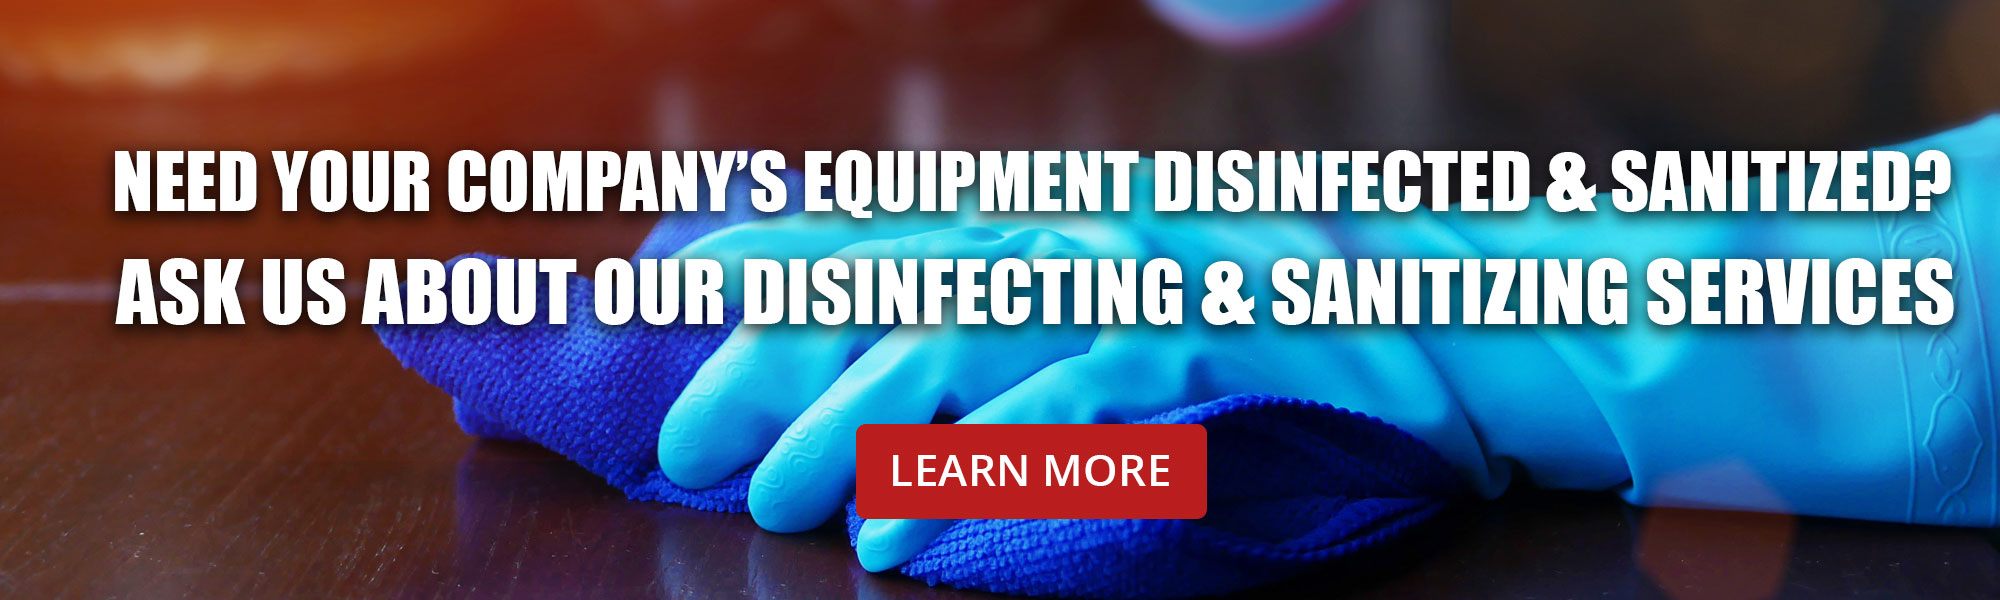 sanitizing ad